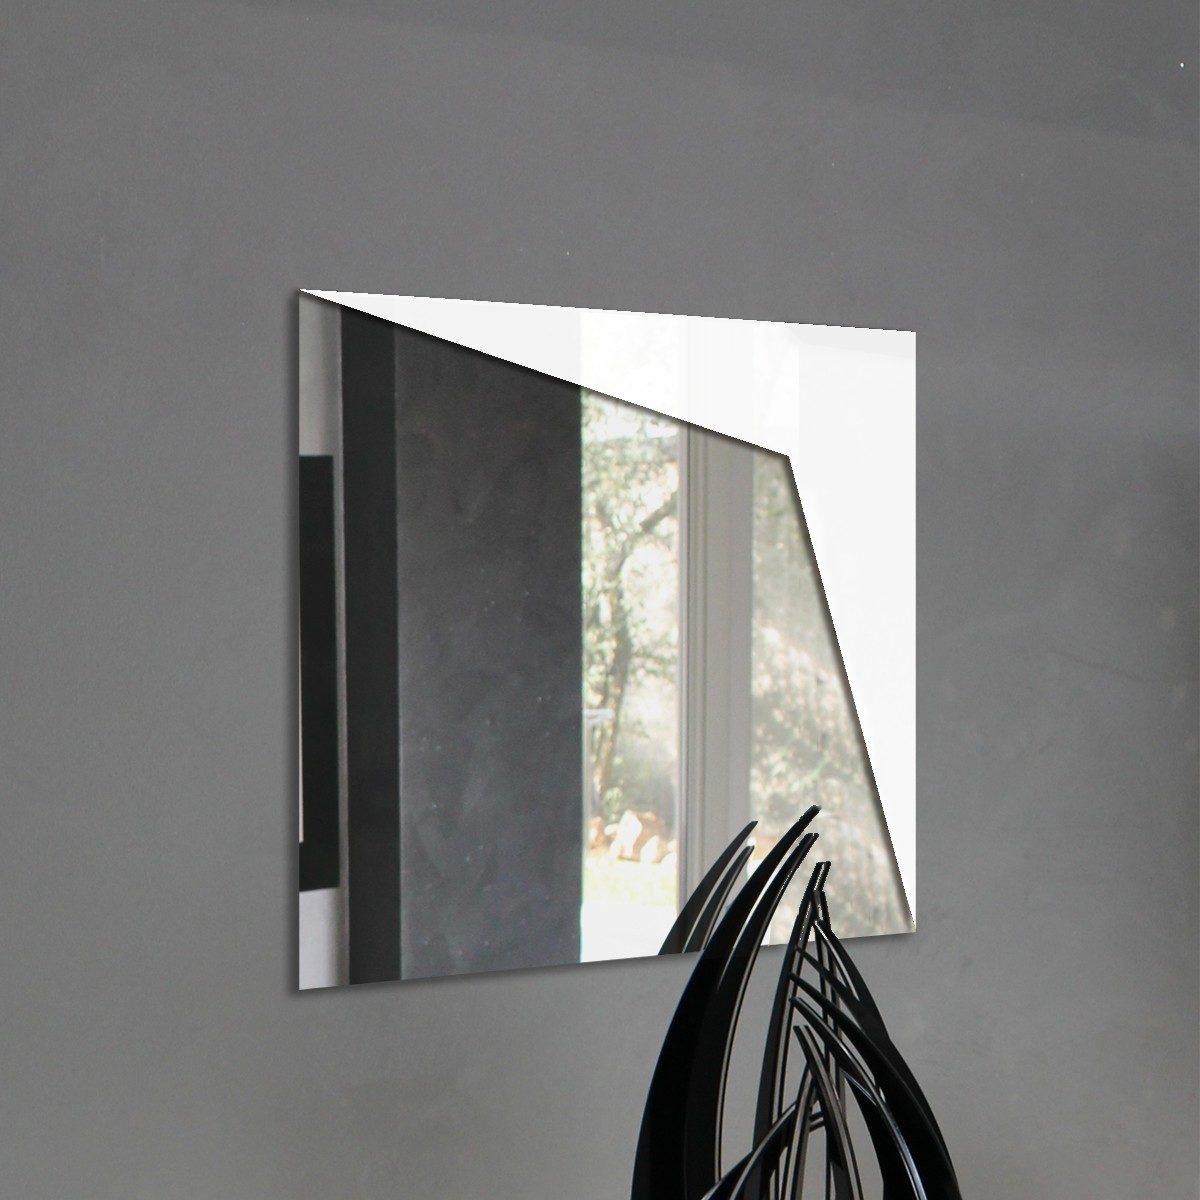 Specchi da parete in plexiglass - Stones - Plexiartglass